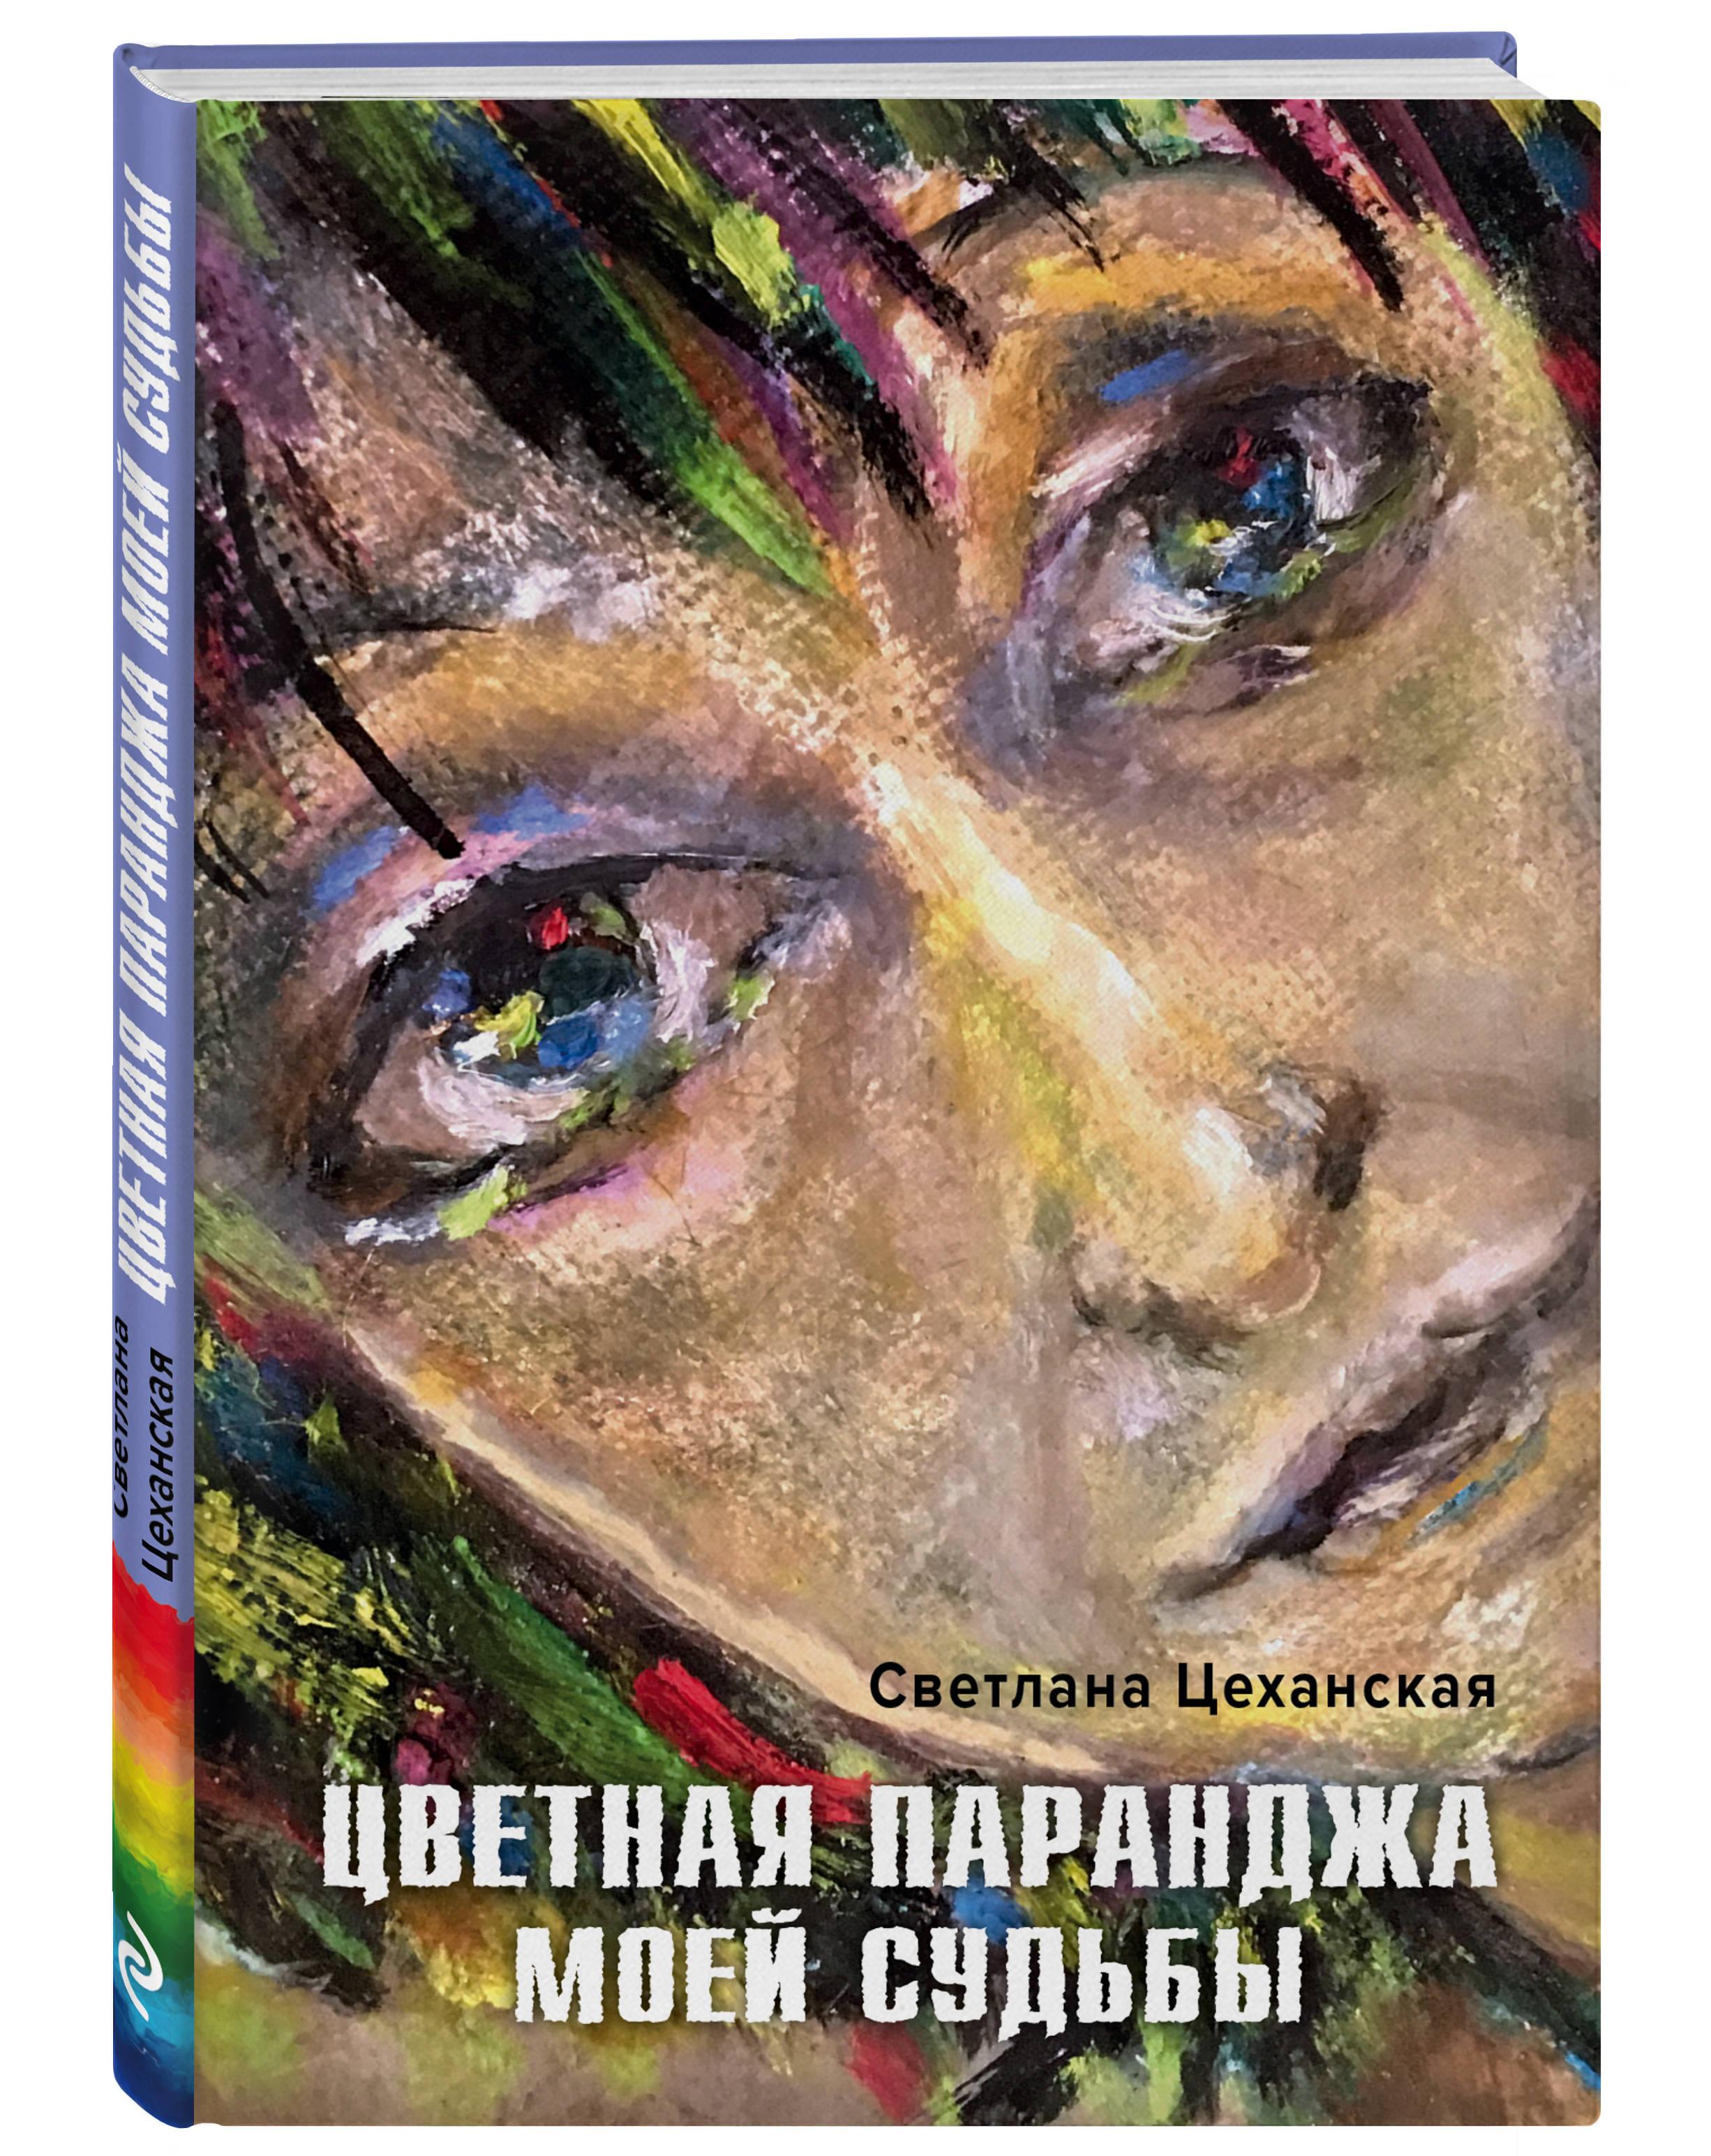 Светлана Цеханская Цветная паранджа моей судьбы